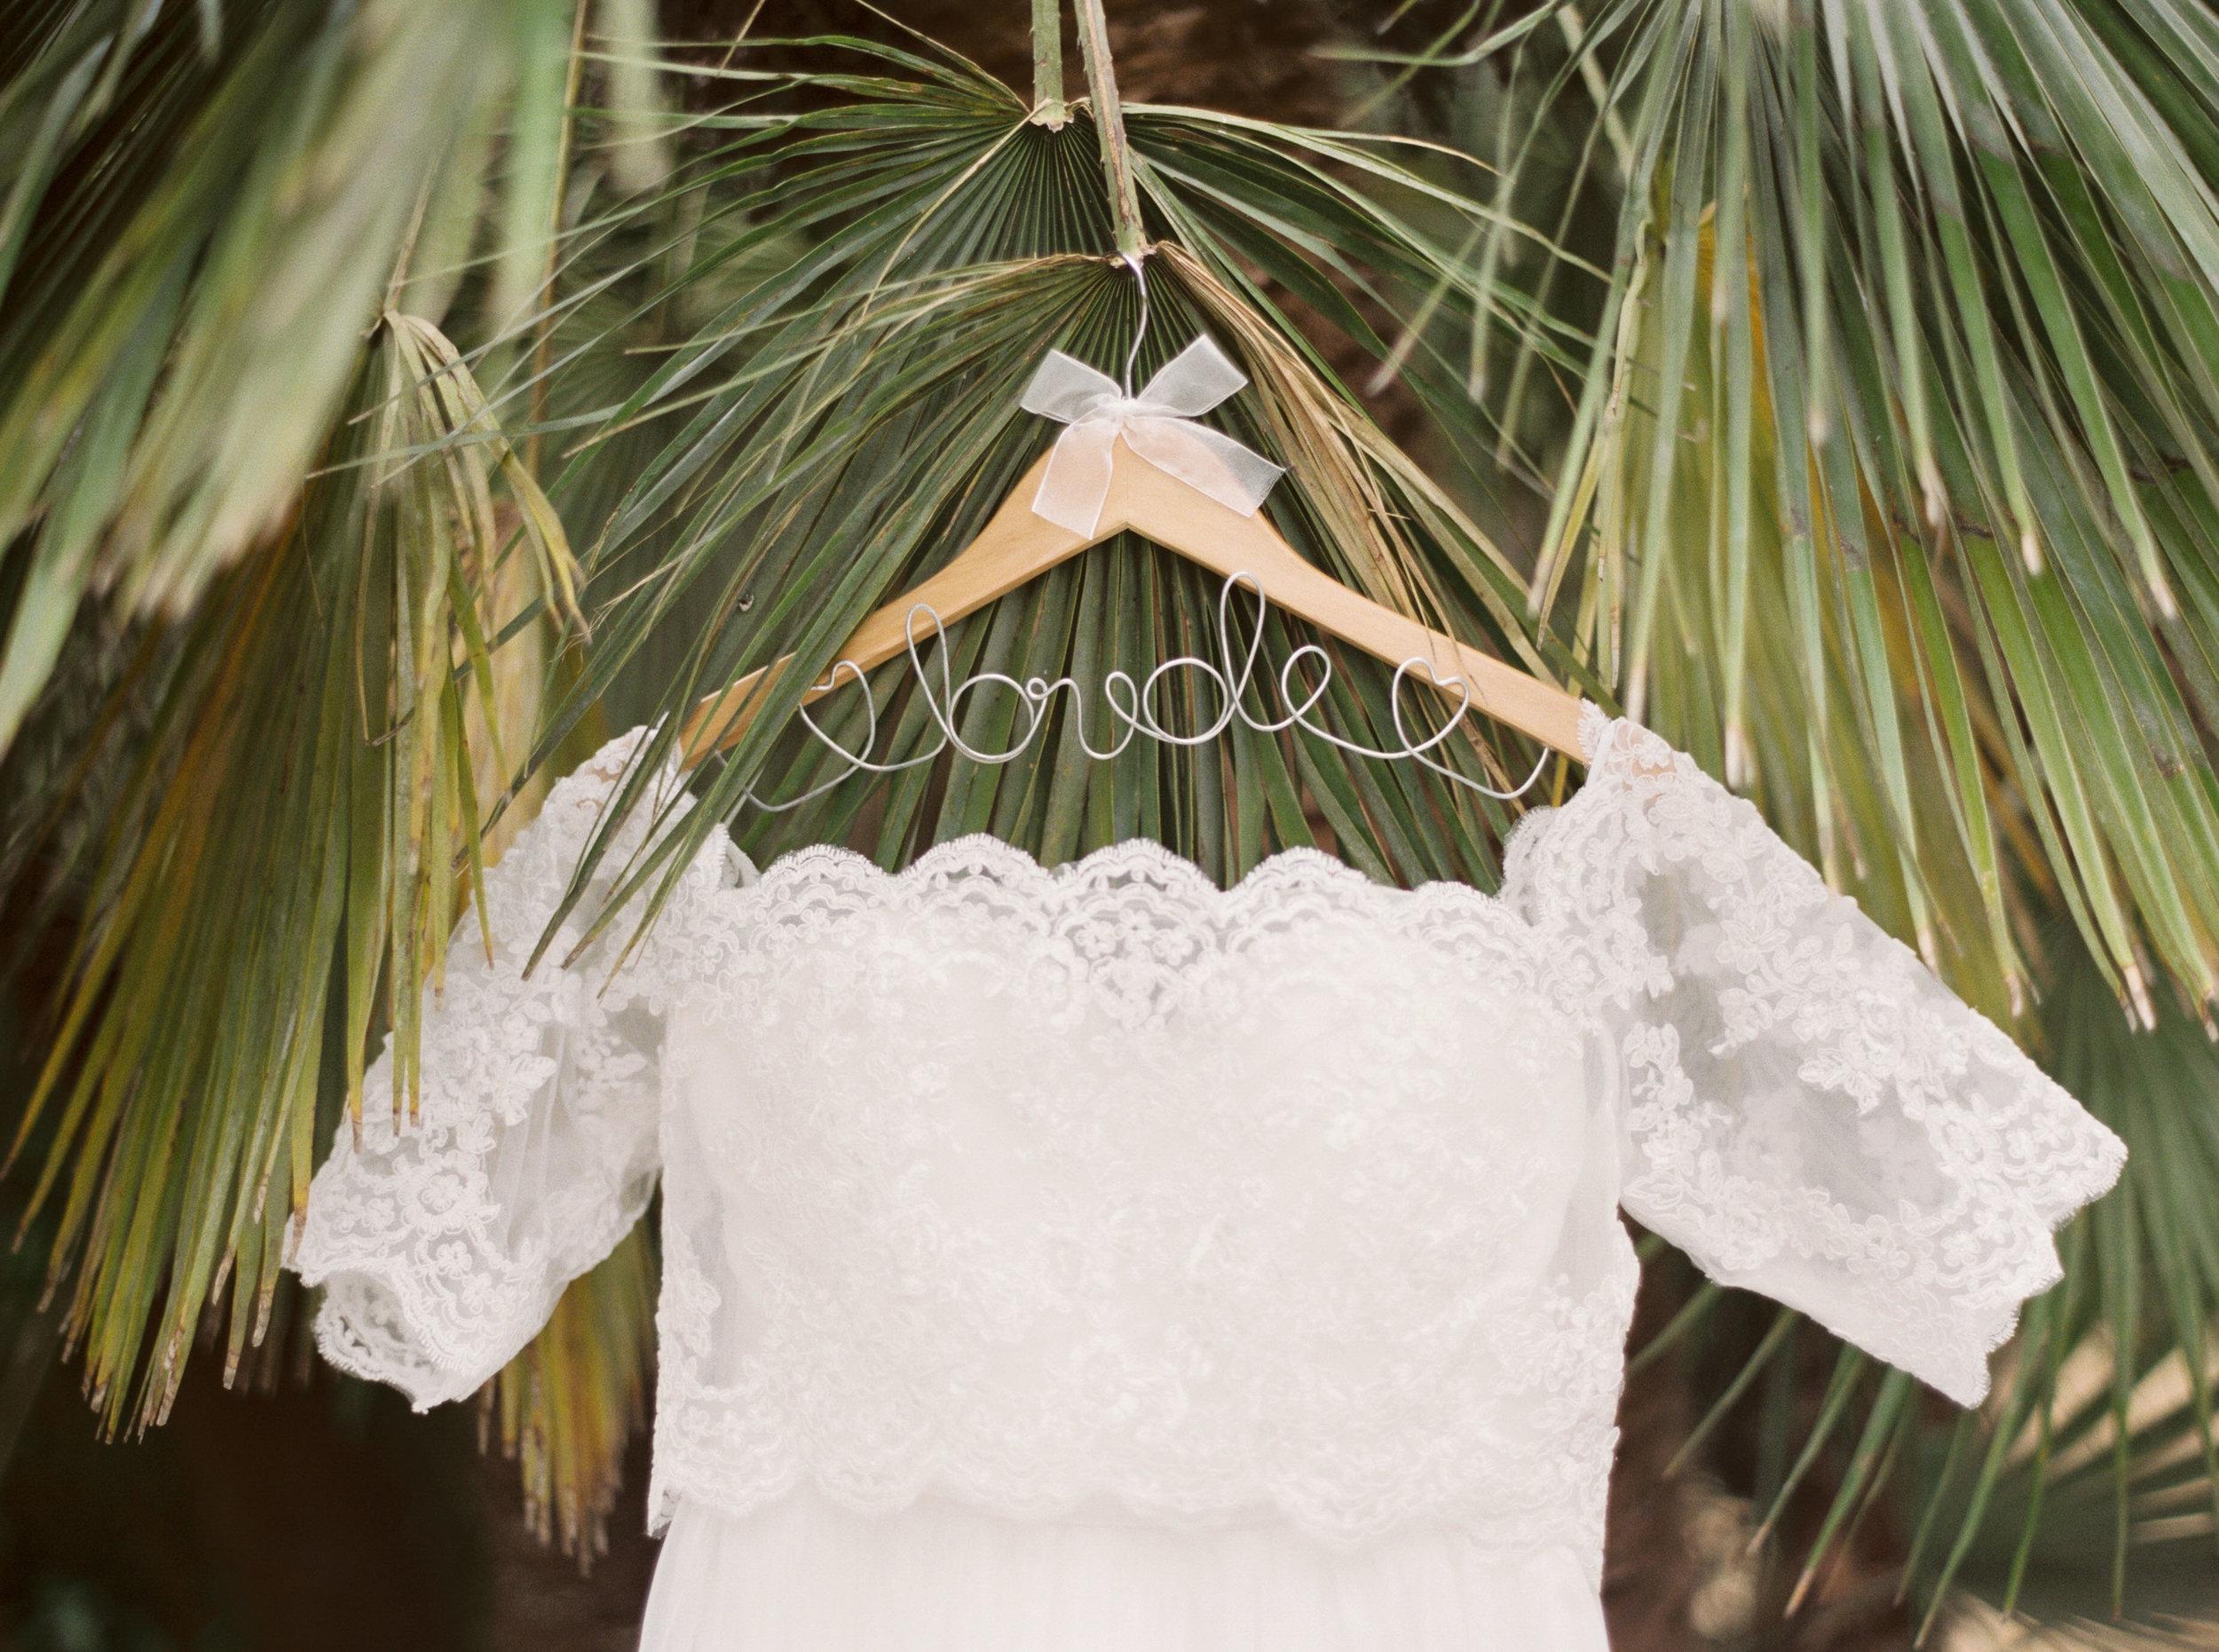 002_Krysten-Crebin-Bay-Area-Elopement-Wedding-Photographer-Videographer.jpg